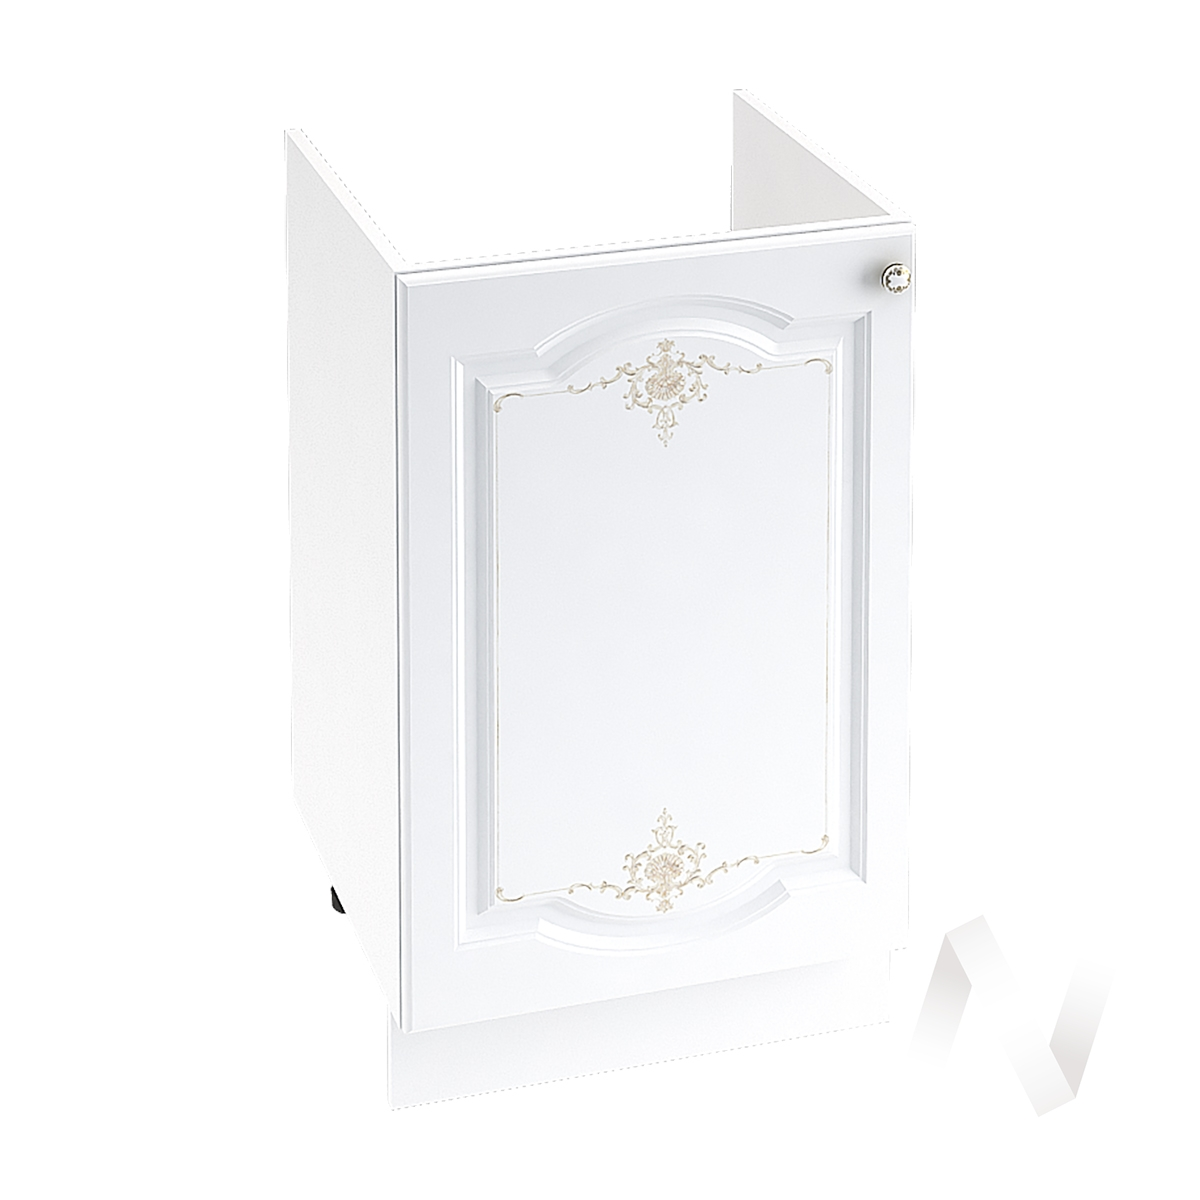 "Кухня ""Шарлиз"": Шкаф нижний под мойку 500, ШНМ 500 (корпус белый)"